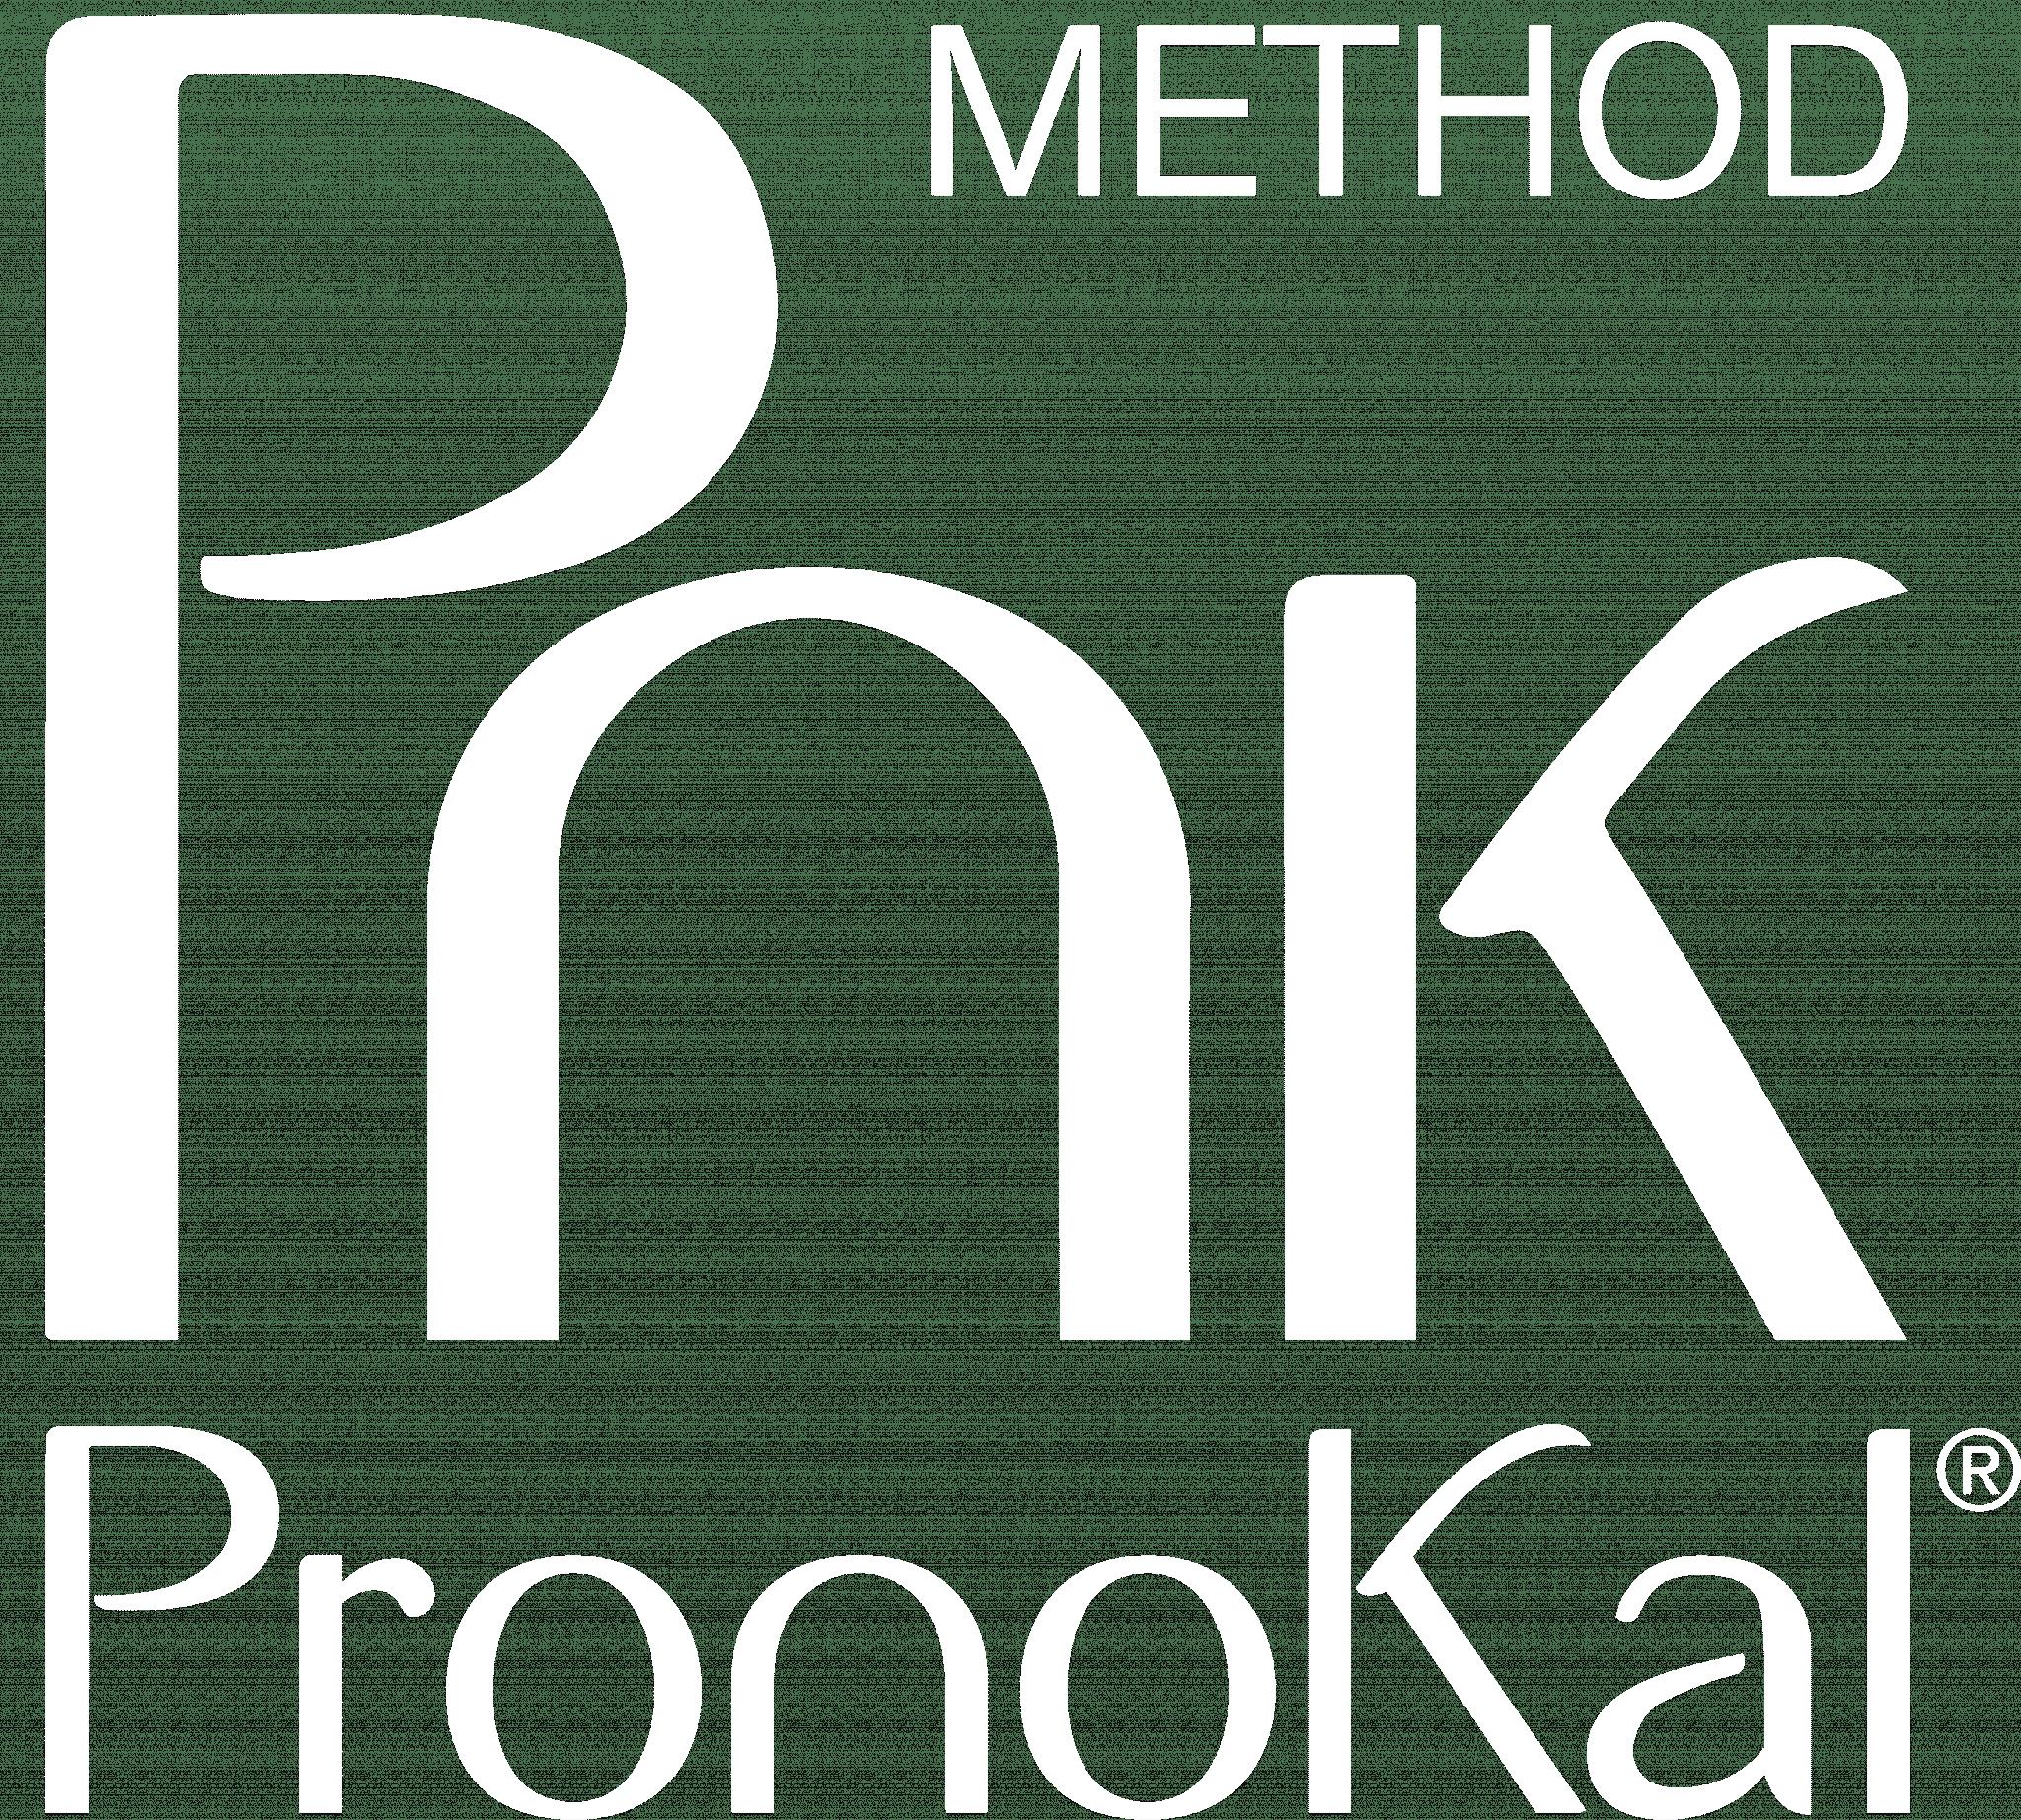 logo_method_pnk-negative